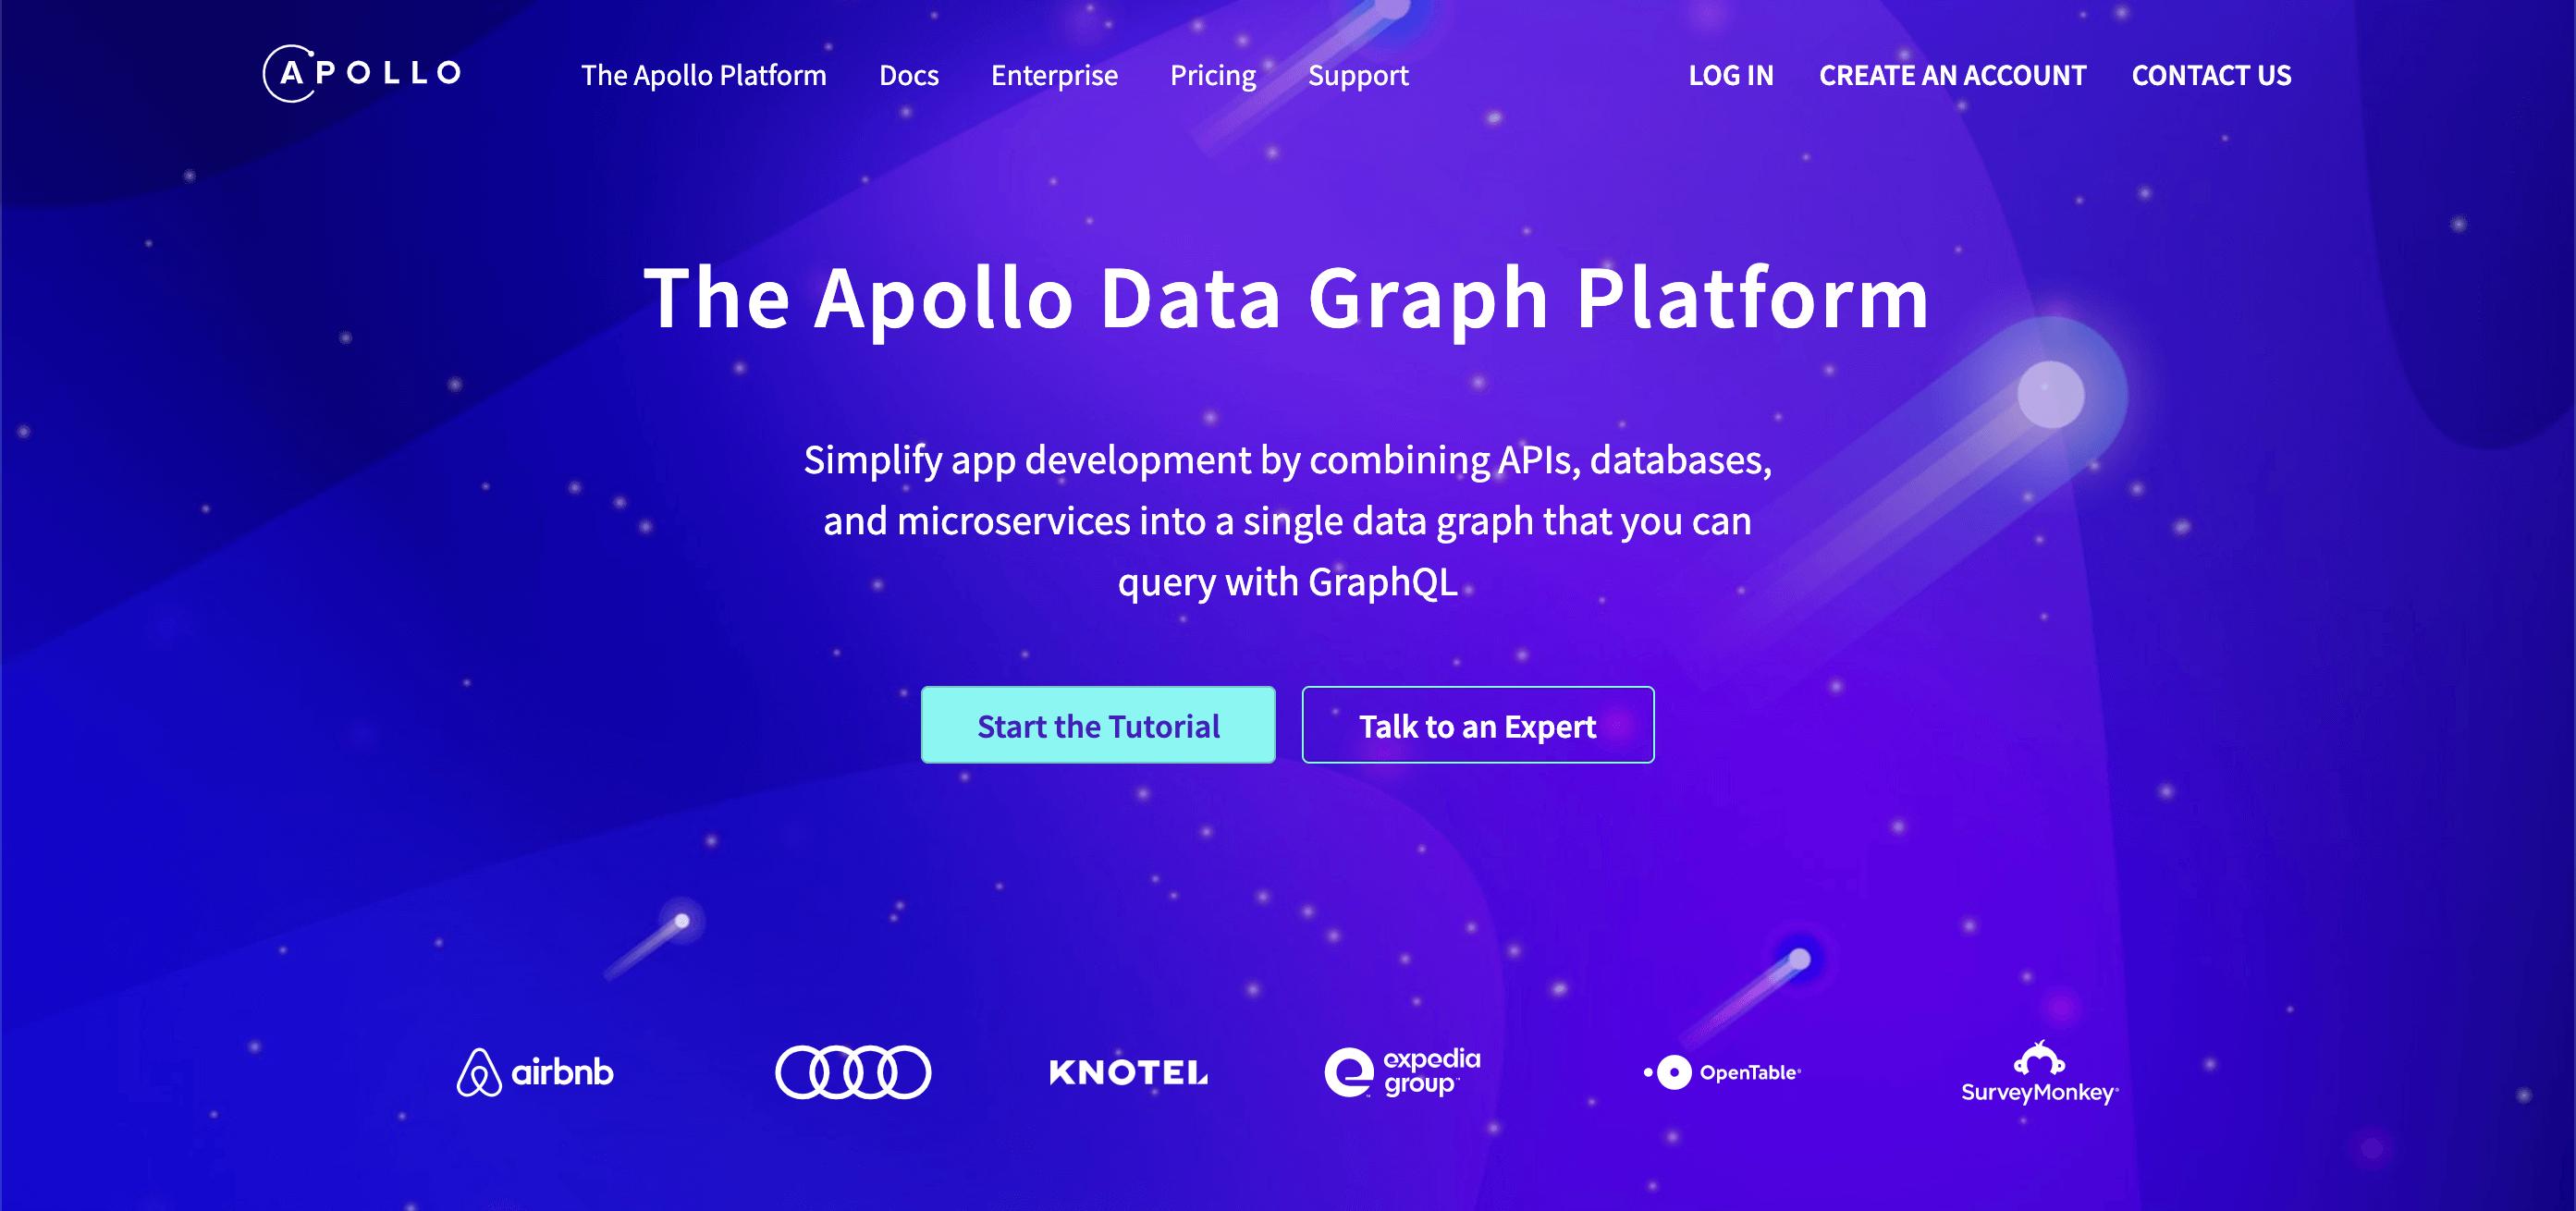 Apollo Careers | Team | Meet the people behind Apollo